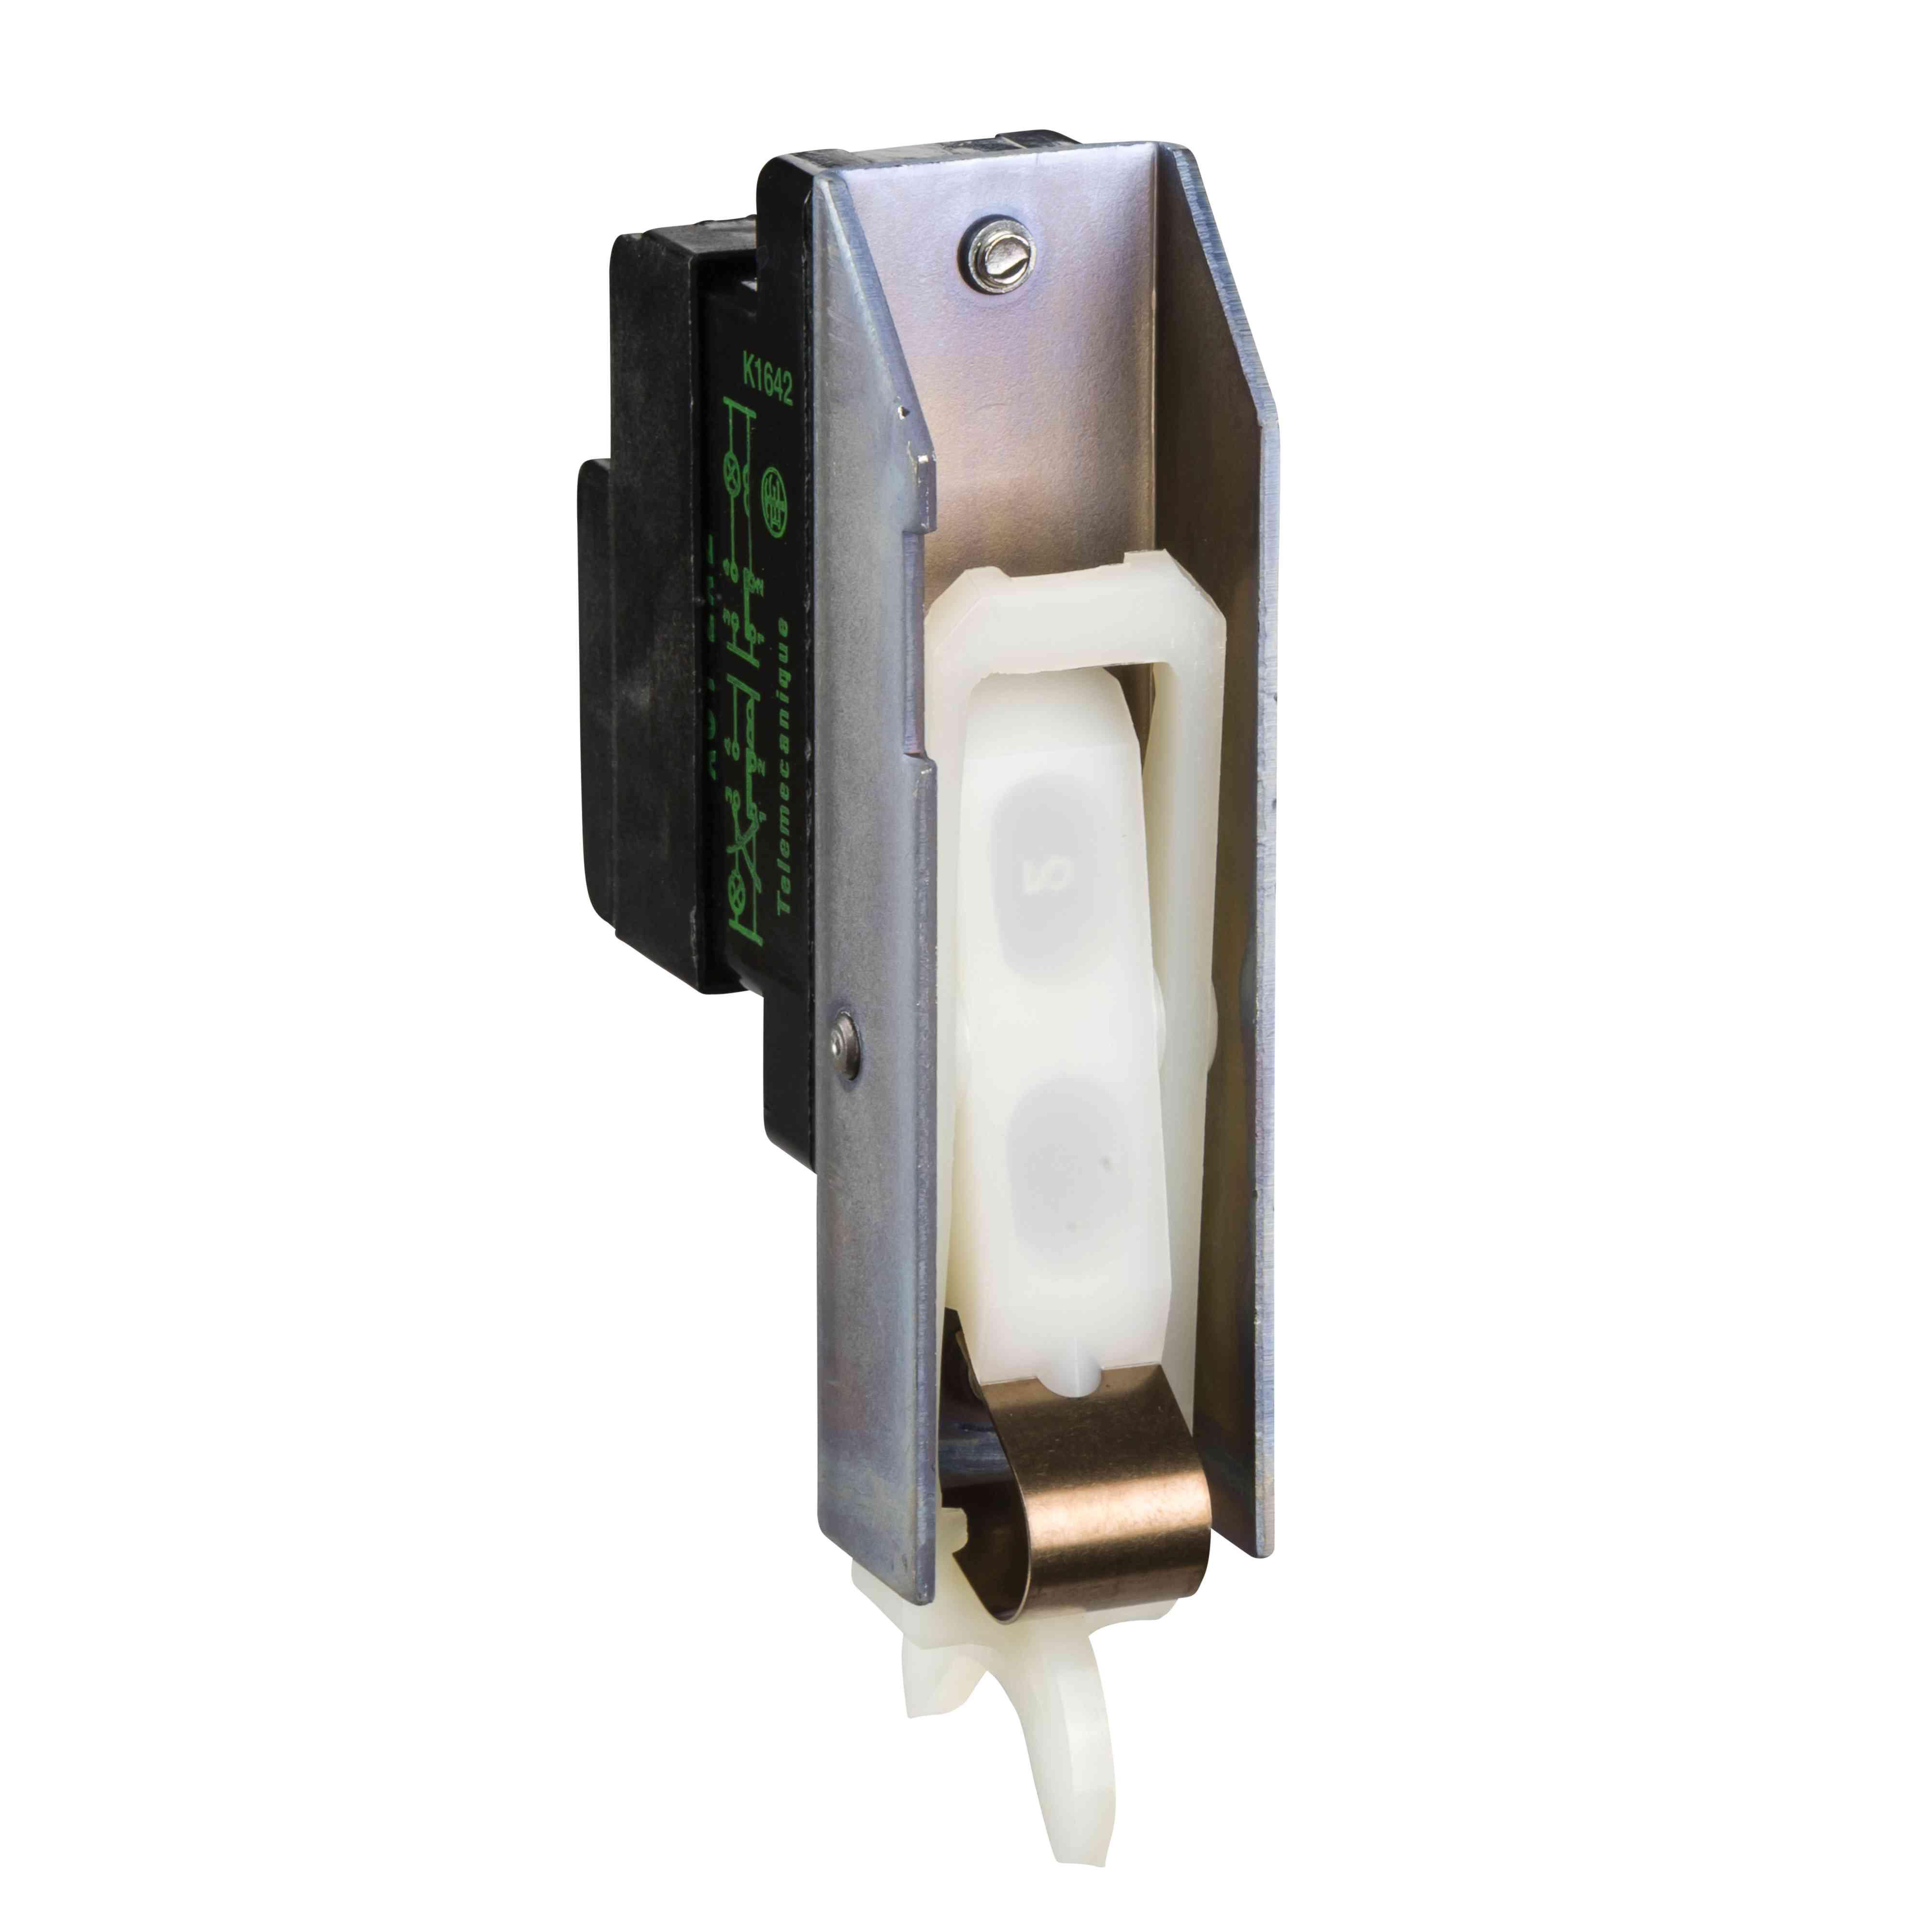 Pomožni kontakt - 1 C/O = 25 mW - s hitrim proženjem